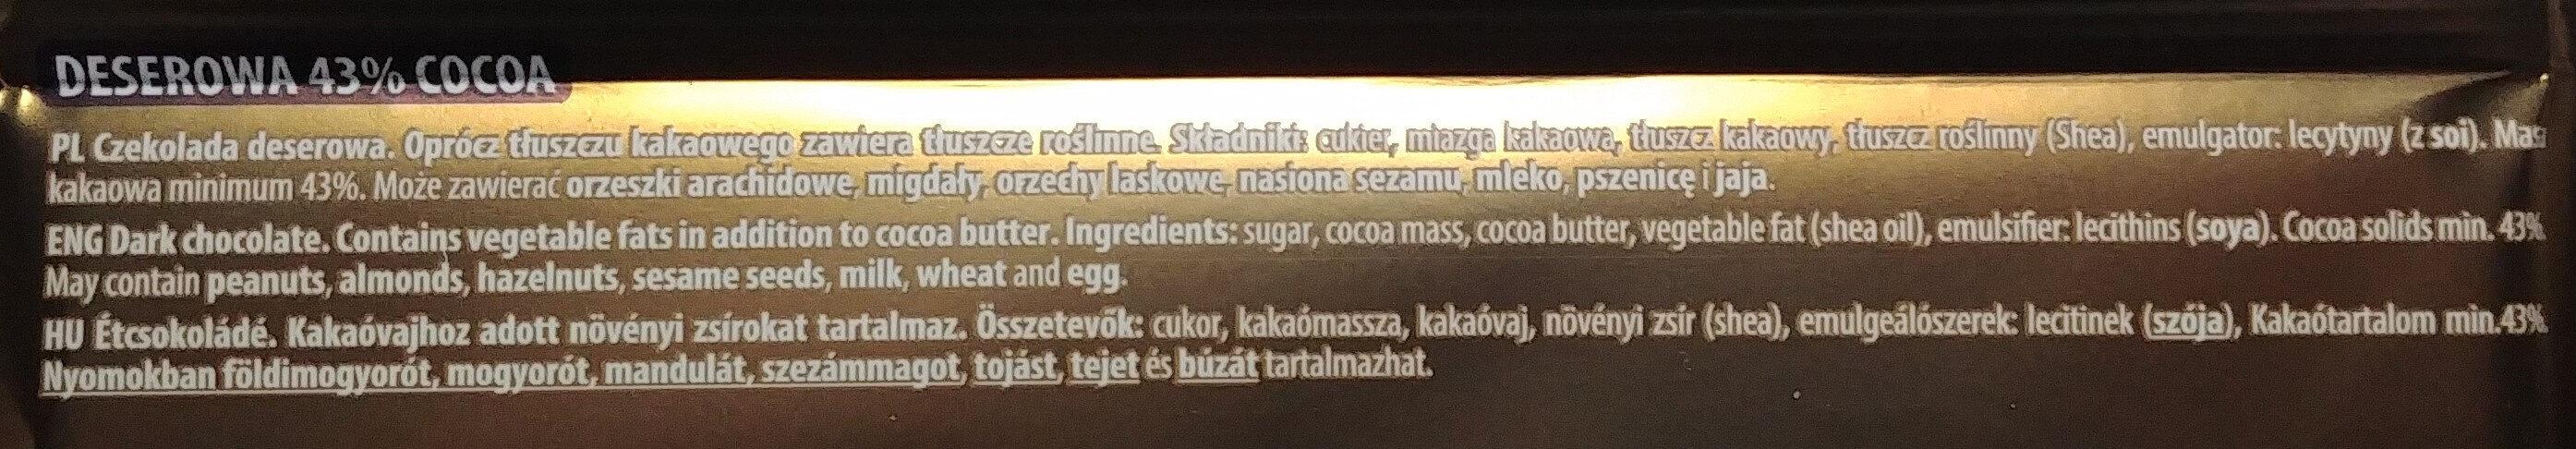 Czekolada deserowa 43% cocoa - Ingredients - pl